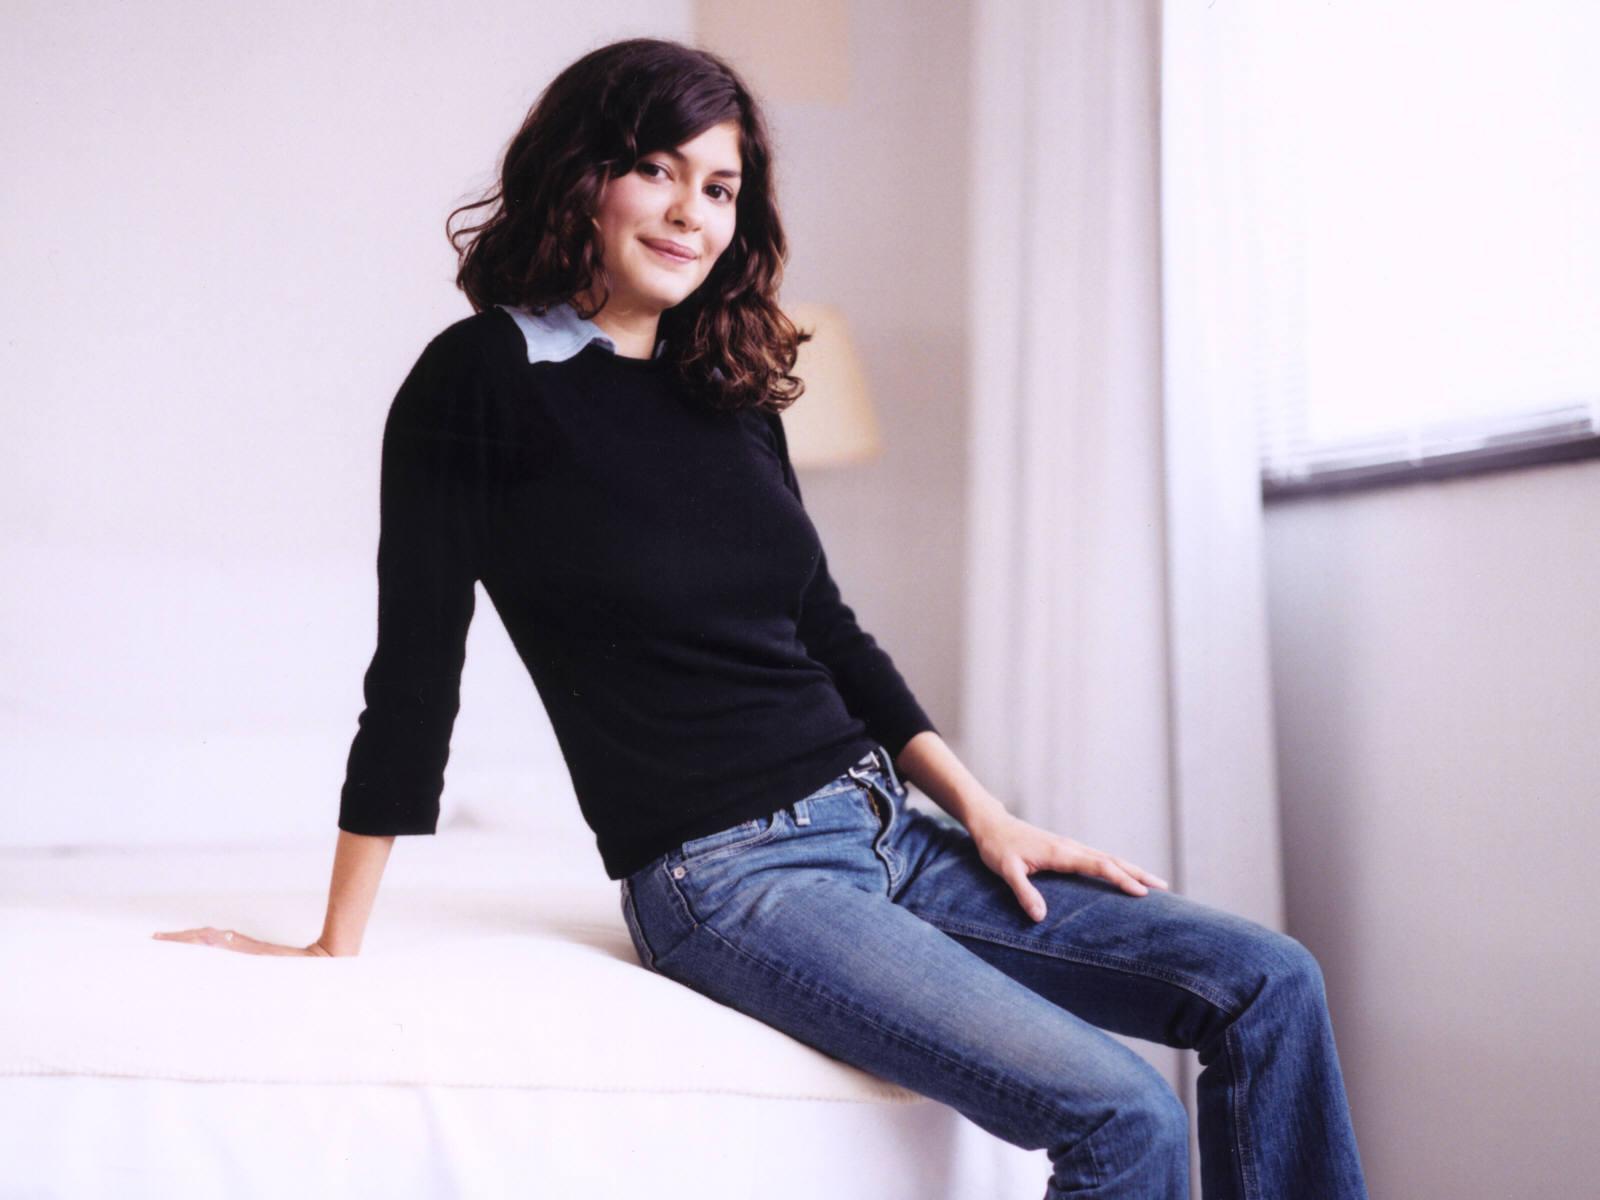 http://4.bp.blogspot.com/-RzXTXR3nSGA/UFmsUCrRk4I/AAAAAAAAM5g/ypEd4uw0ybM/s1600/fond-ecran-celebrites-feminines-audrey-tautou-003.jpg